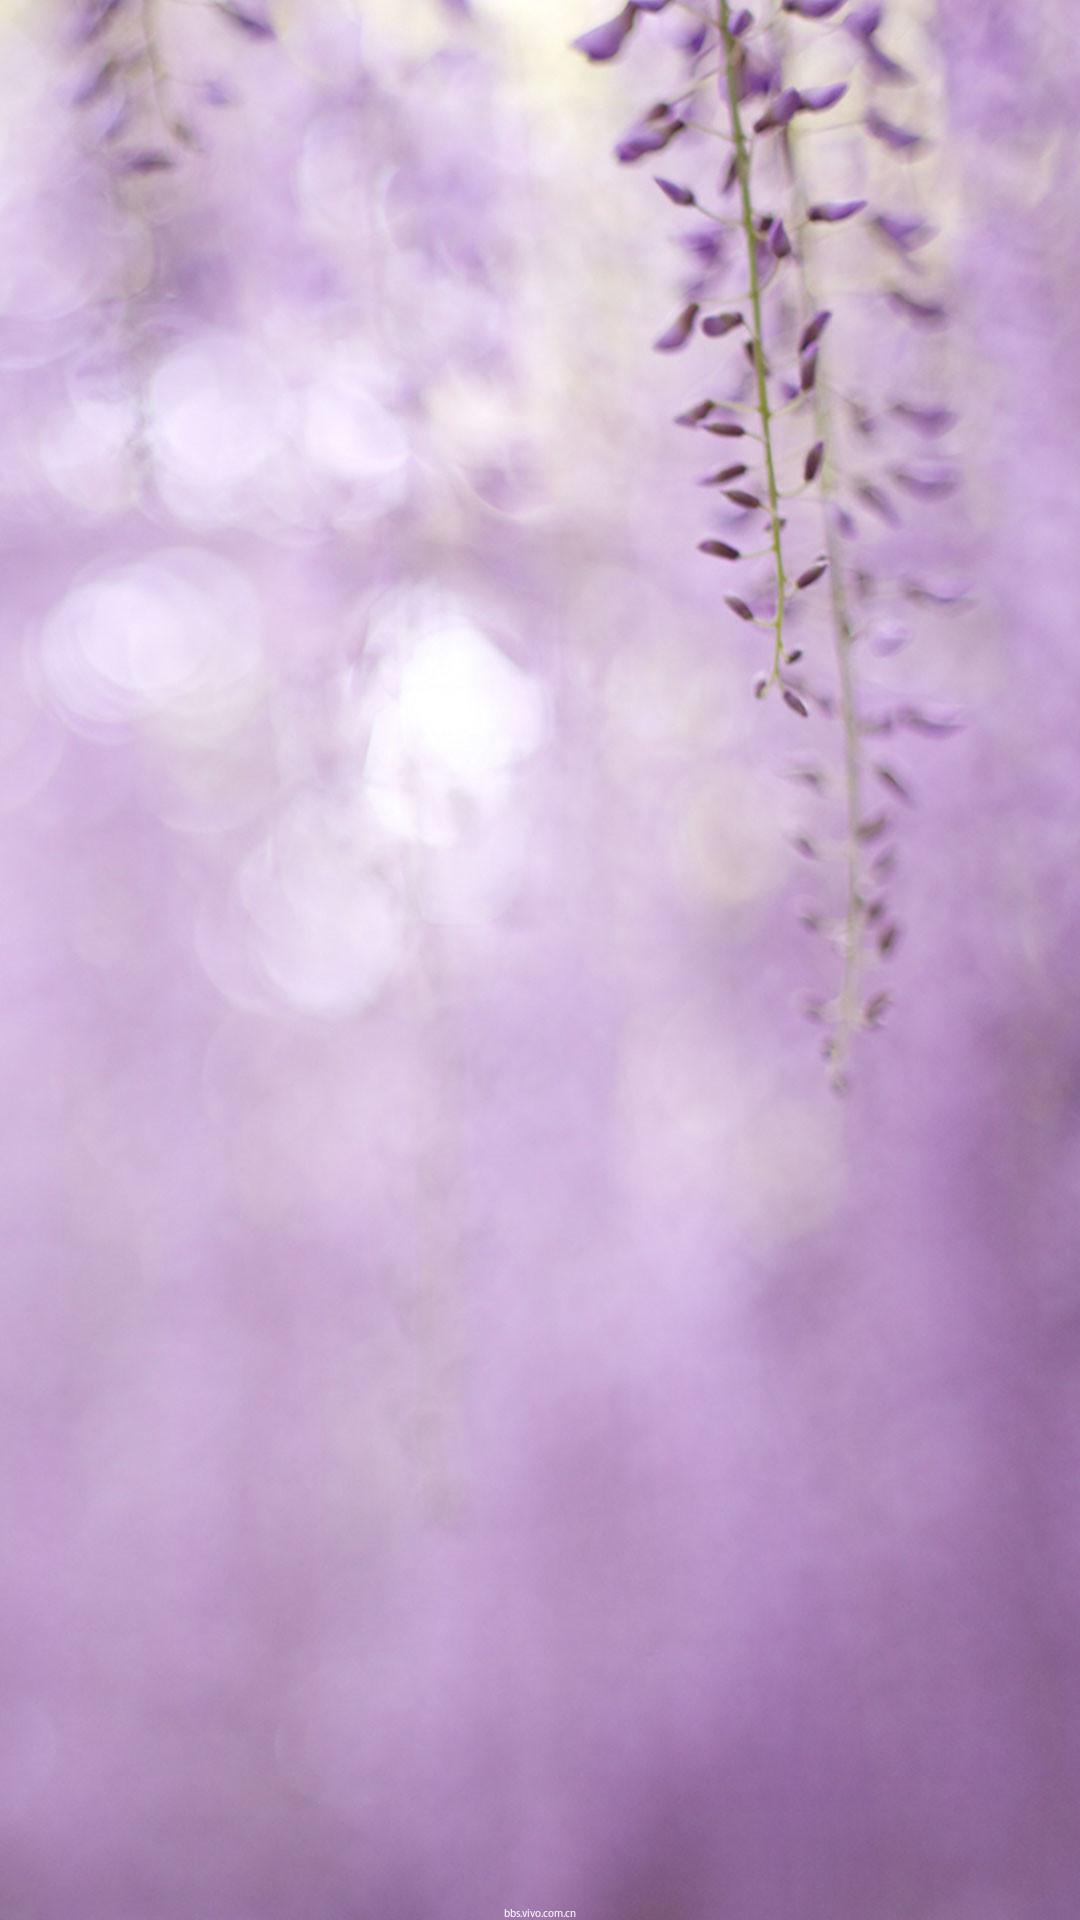 【v粉主题素材壁纸】淡紫色丁香花9p